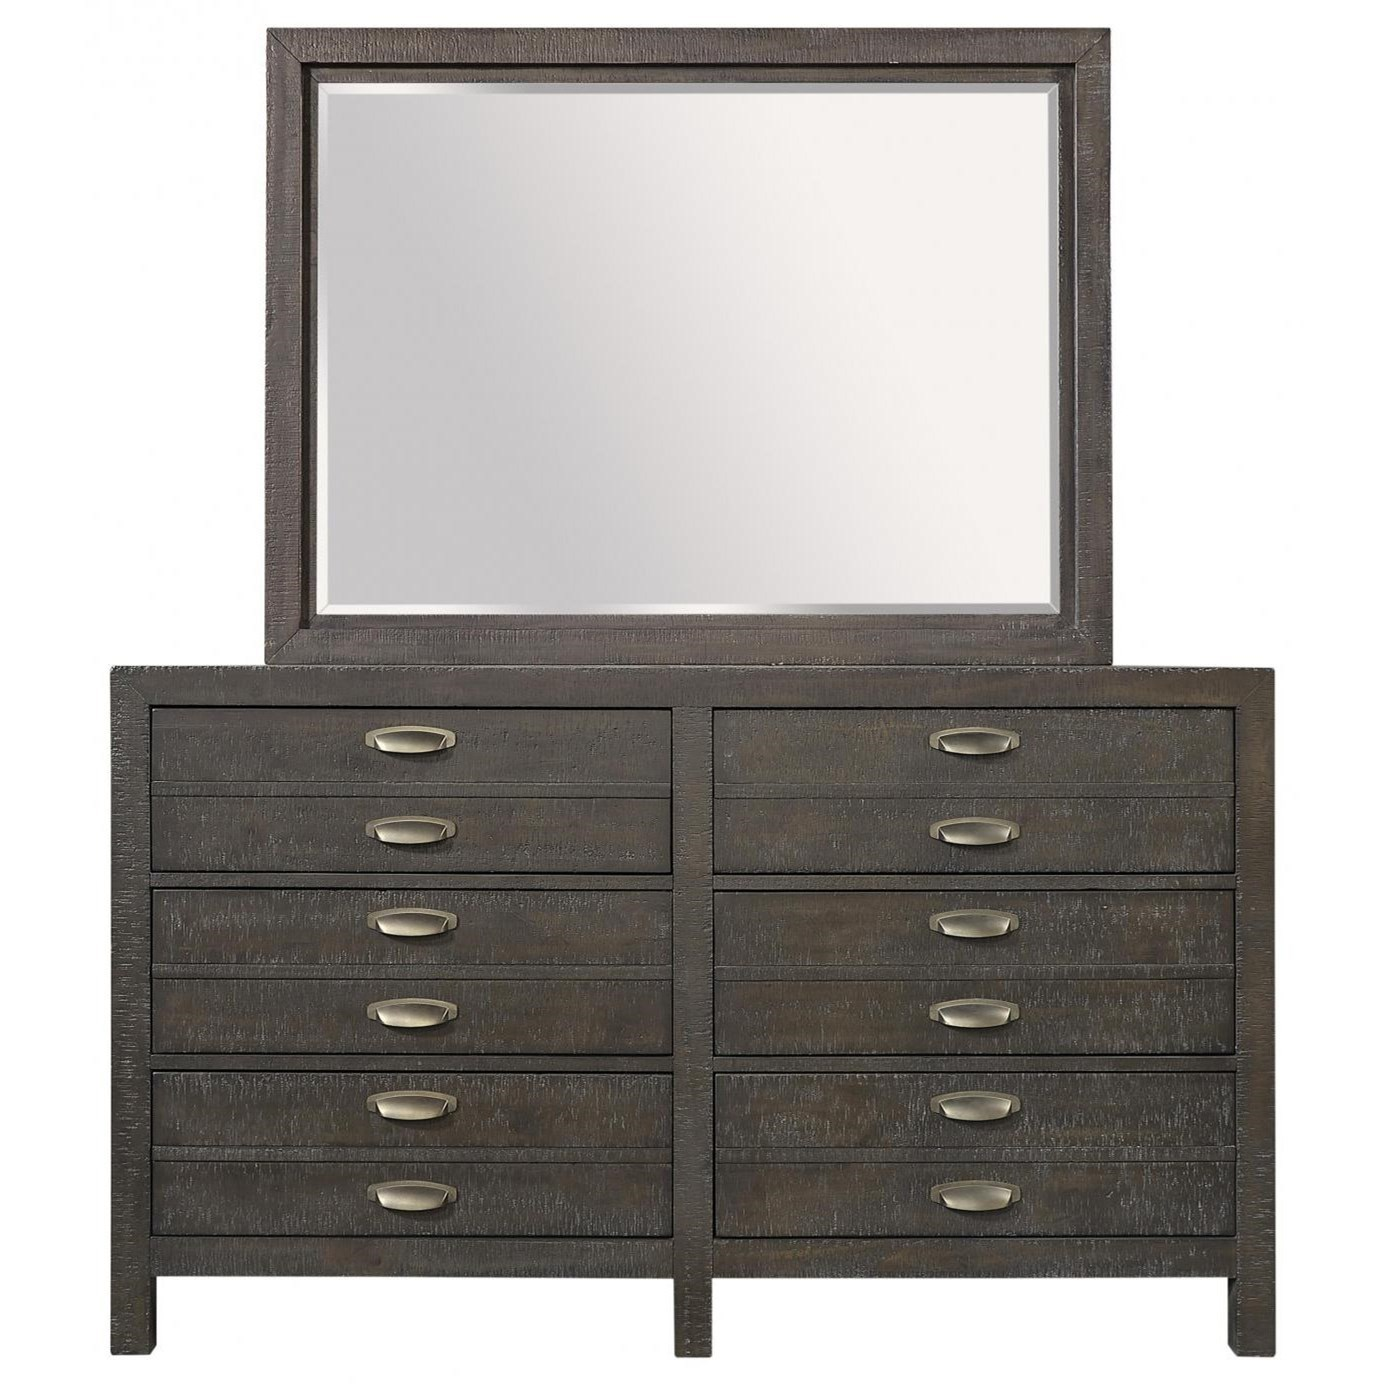 Radiata Dresser Mirror Combo by Aspenhome at Walker's Furniture